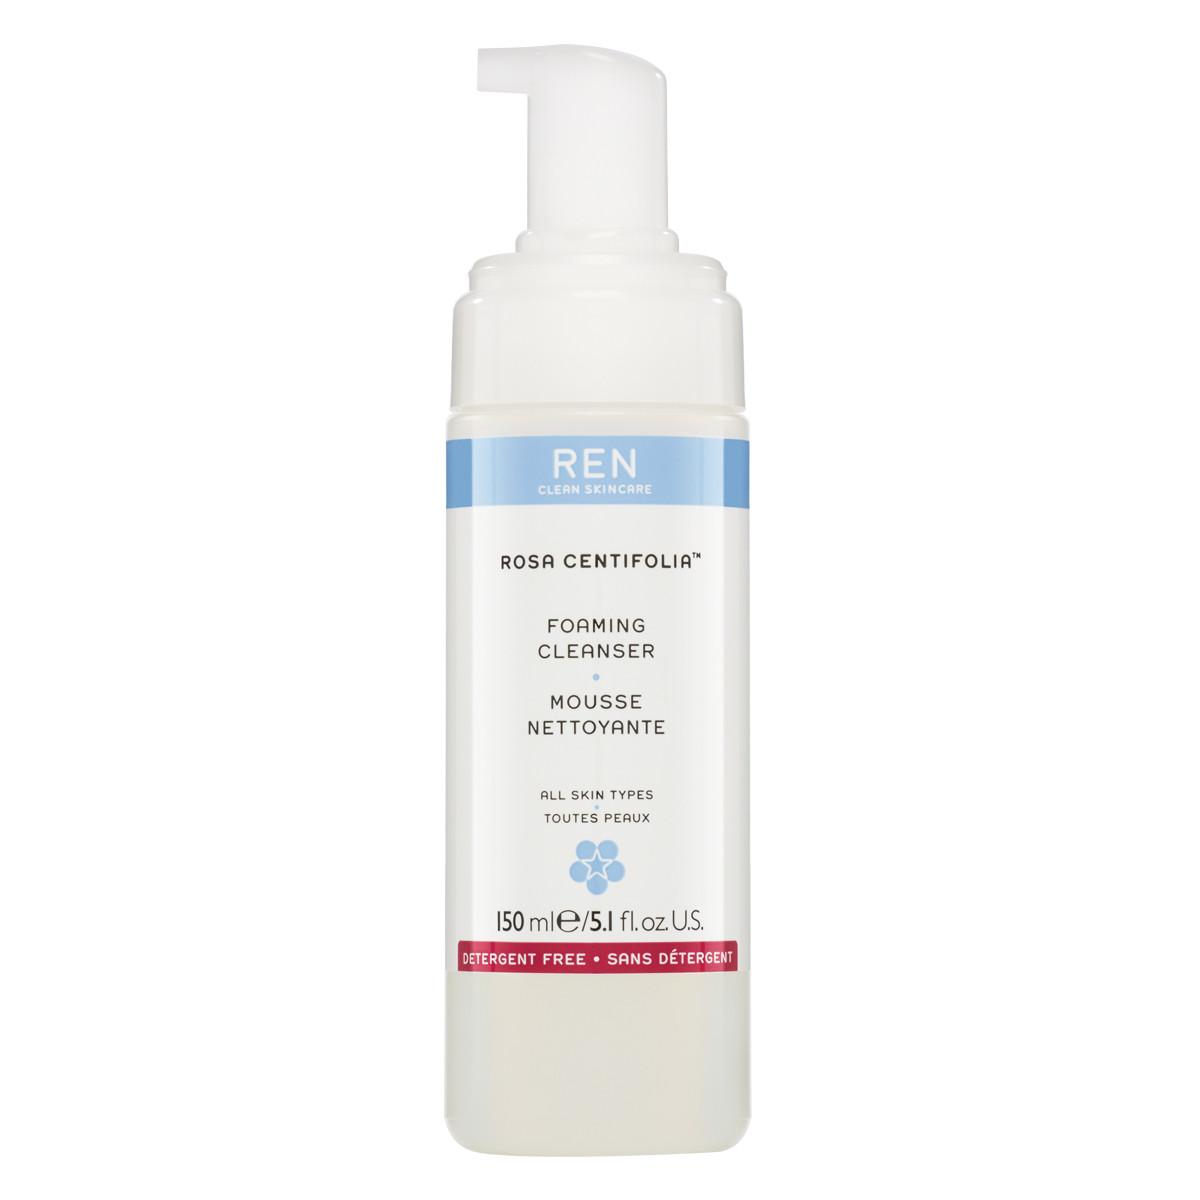 ren-clean-skincare-rosa-centifolia-foaming-cleanser-reinigungsschaum